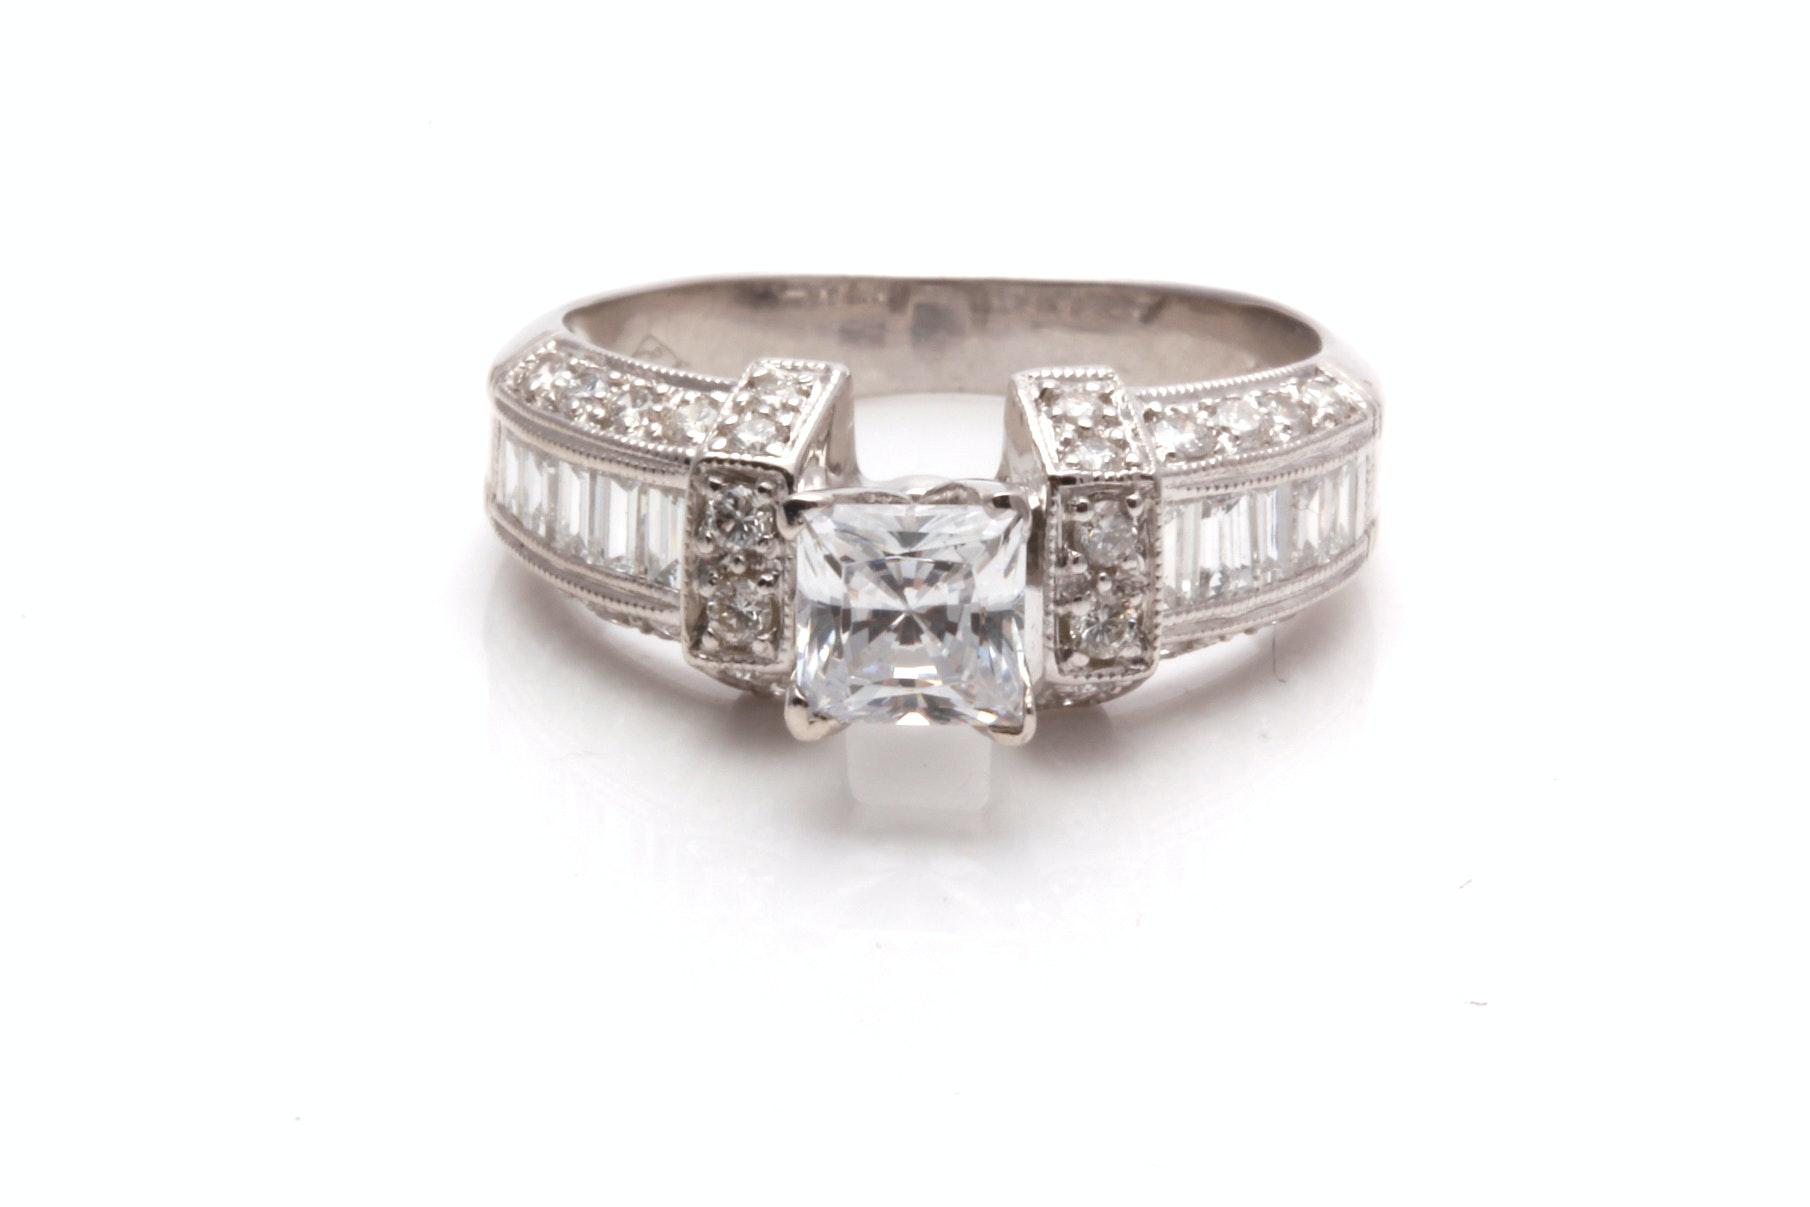 14K White Gold Semi Mount Diamond Ring With Cubic Zirconia Center Stone